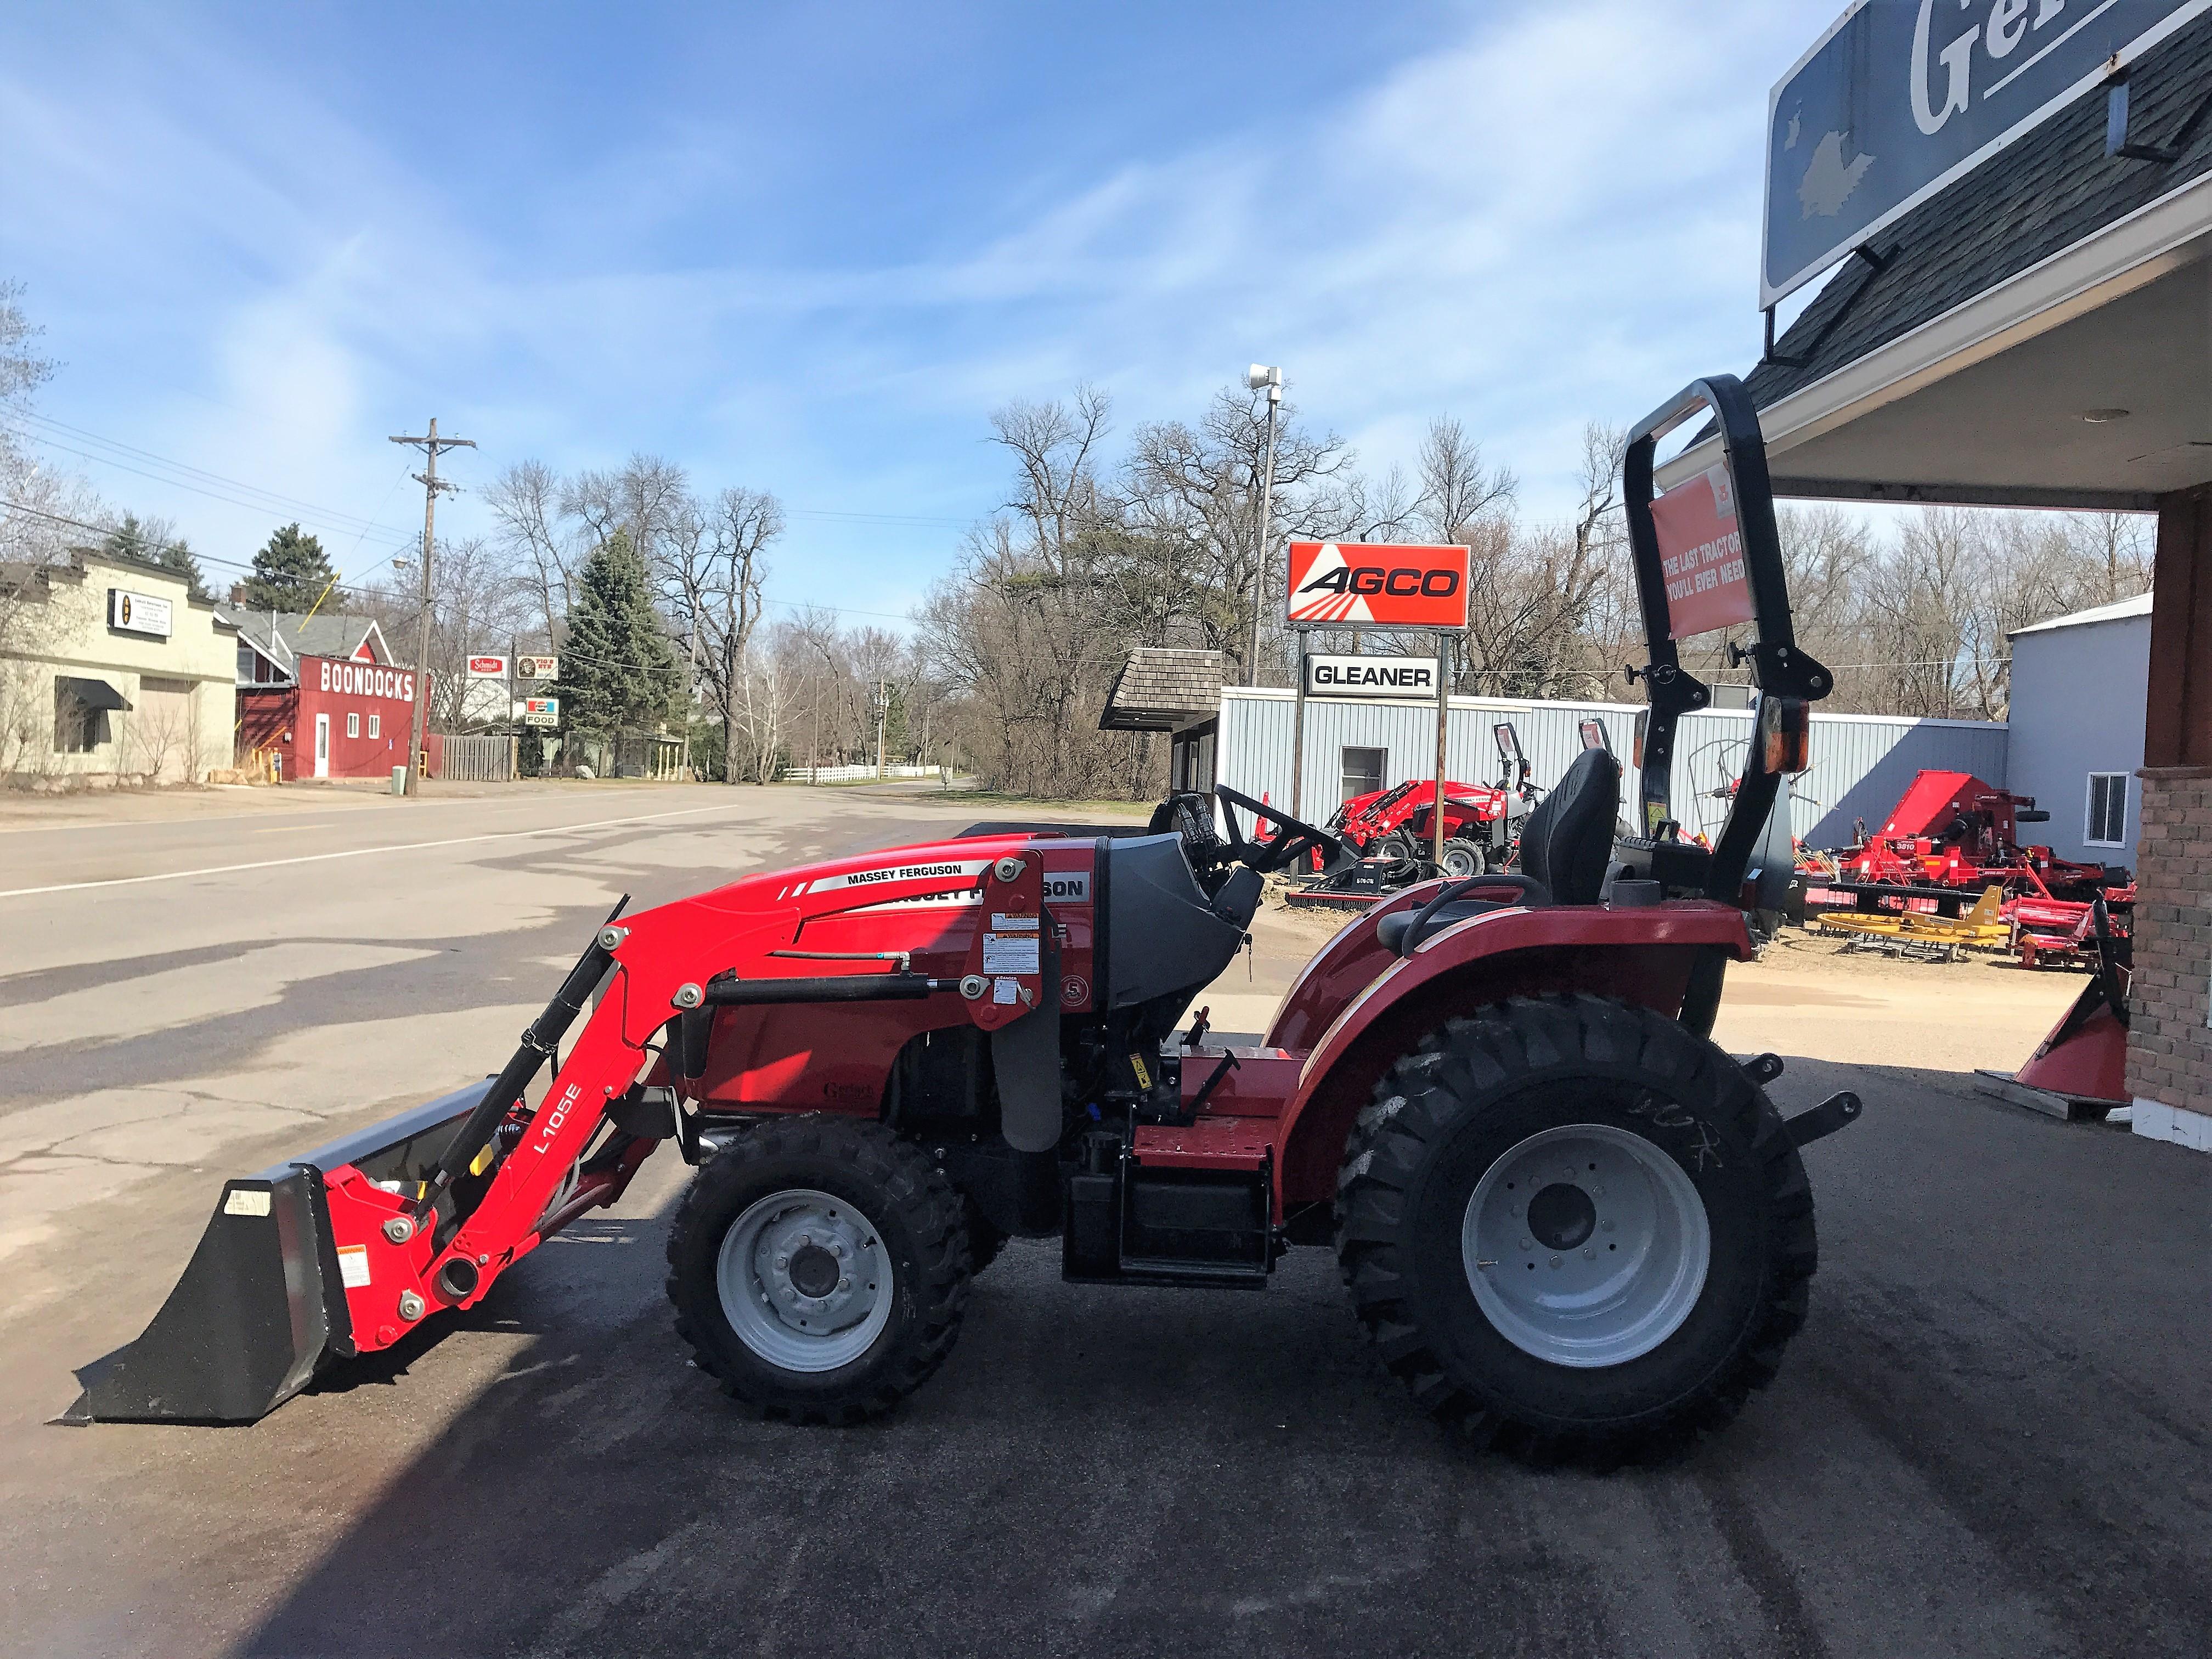 Massey Ferguson - New Equipment - Gerlach Service